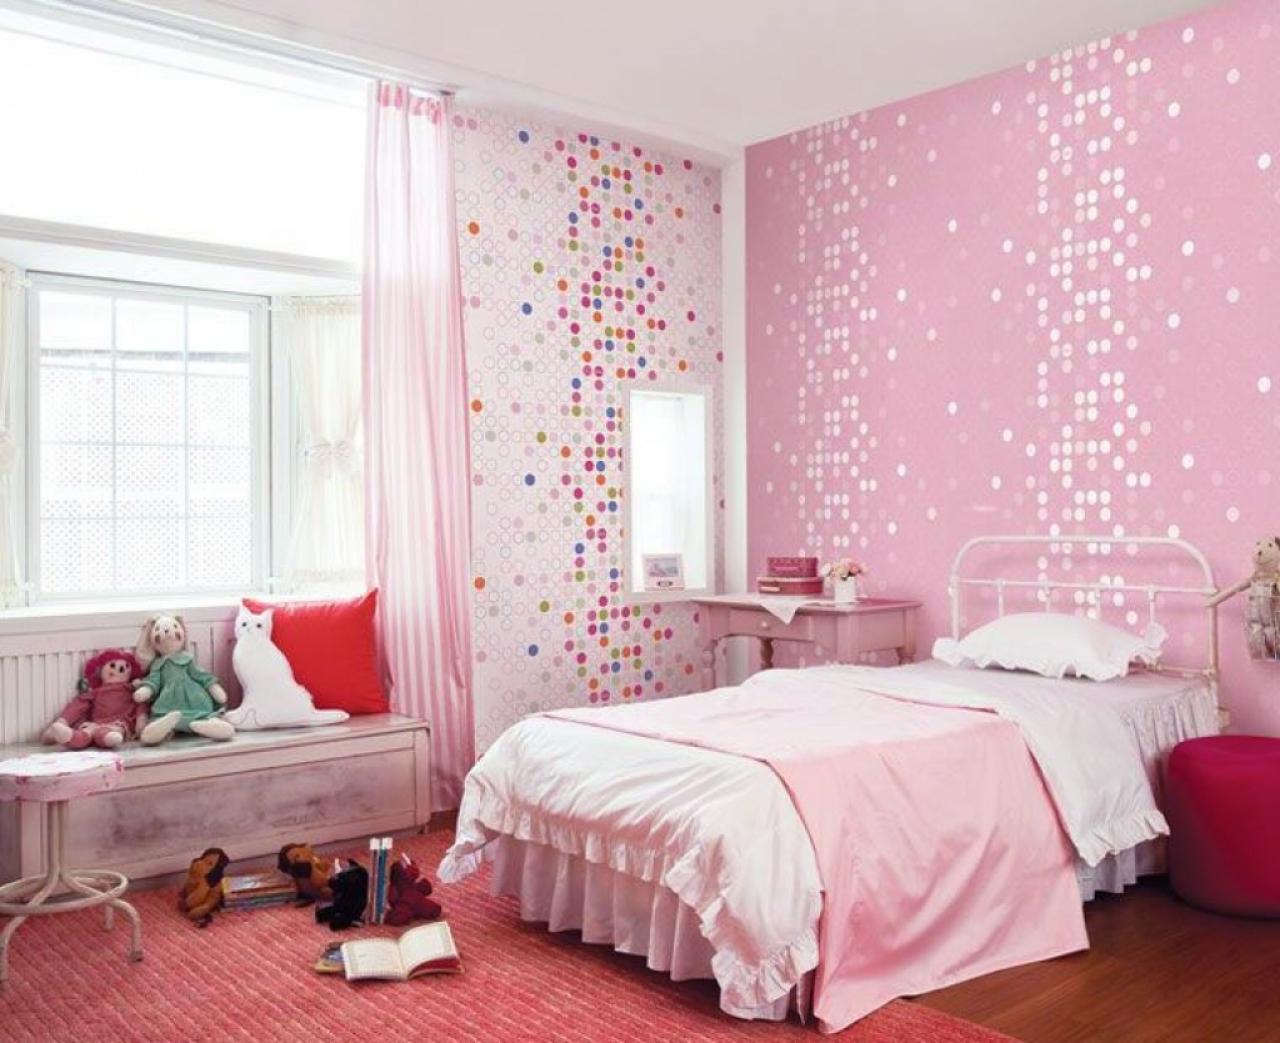 Kids room cute pink dotty wallpaper girls bedroom home design Kids 1280x1043